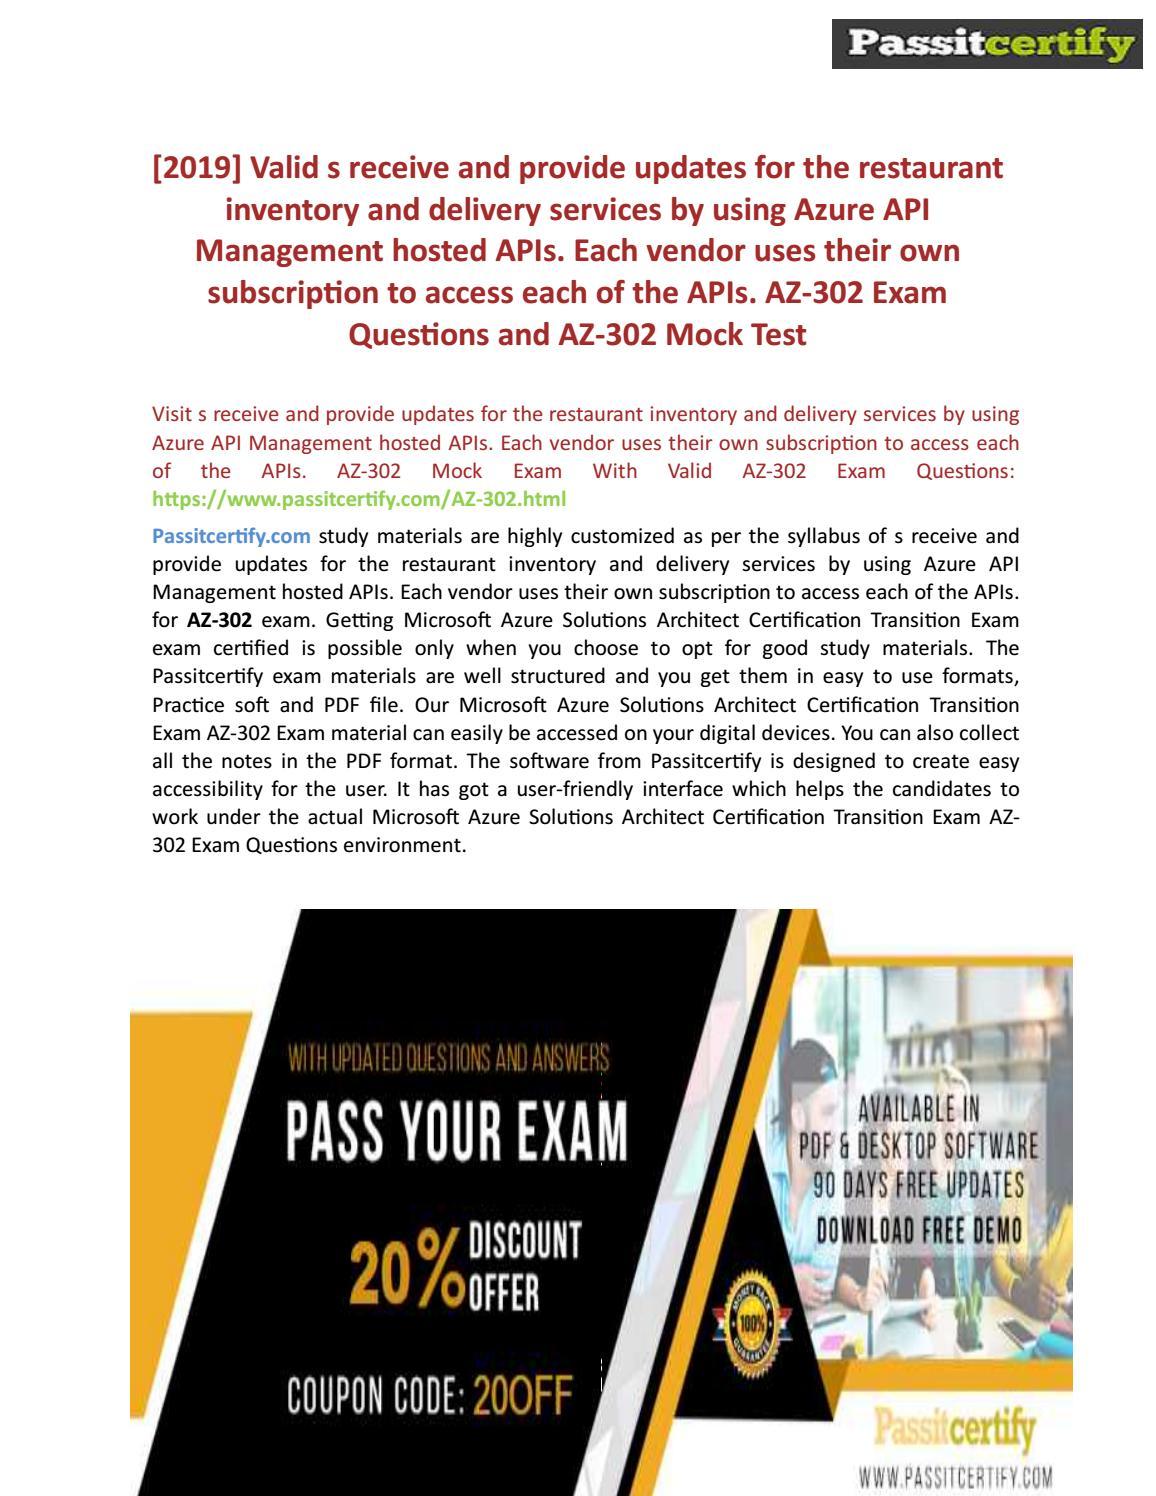 Microsoft Azure Solutions Architect AZ-302 Practice Test by